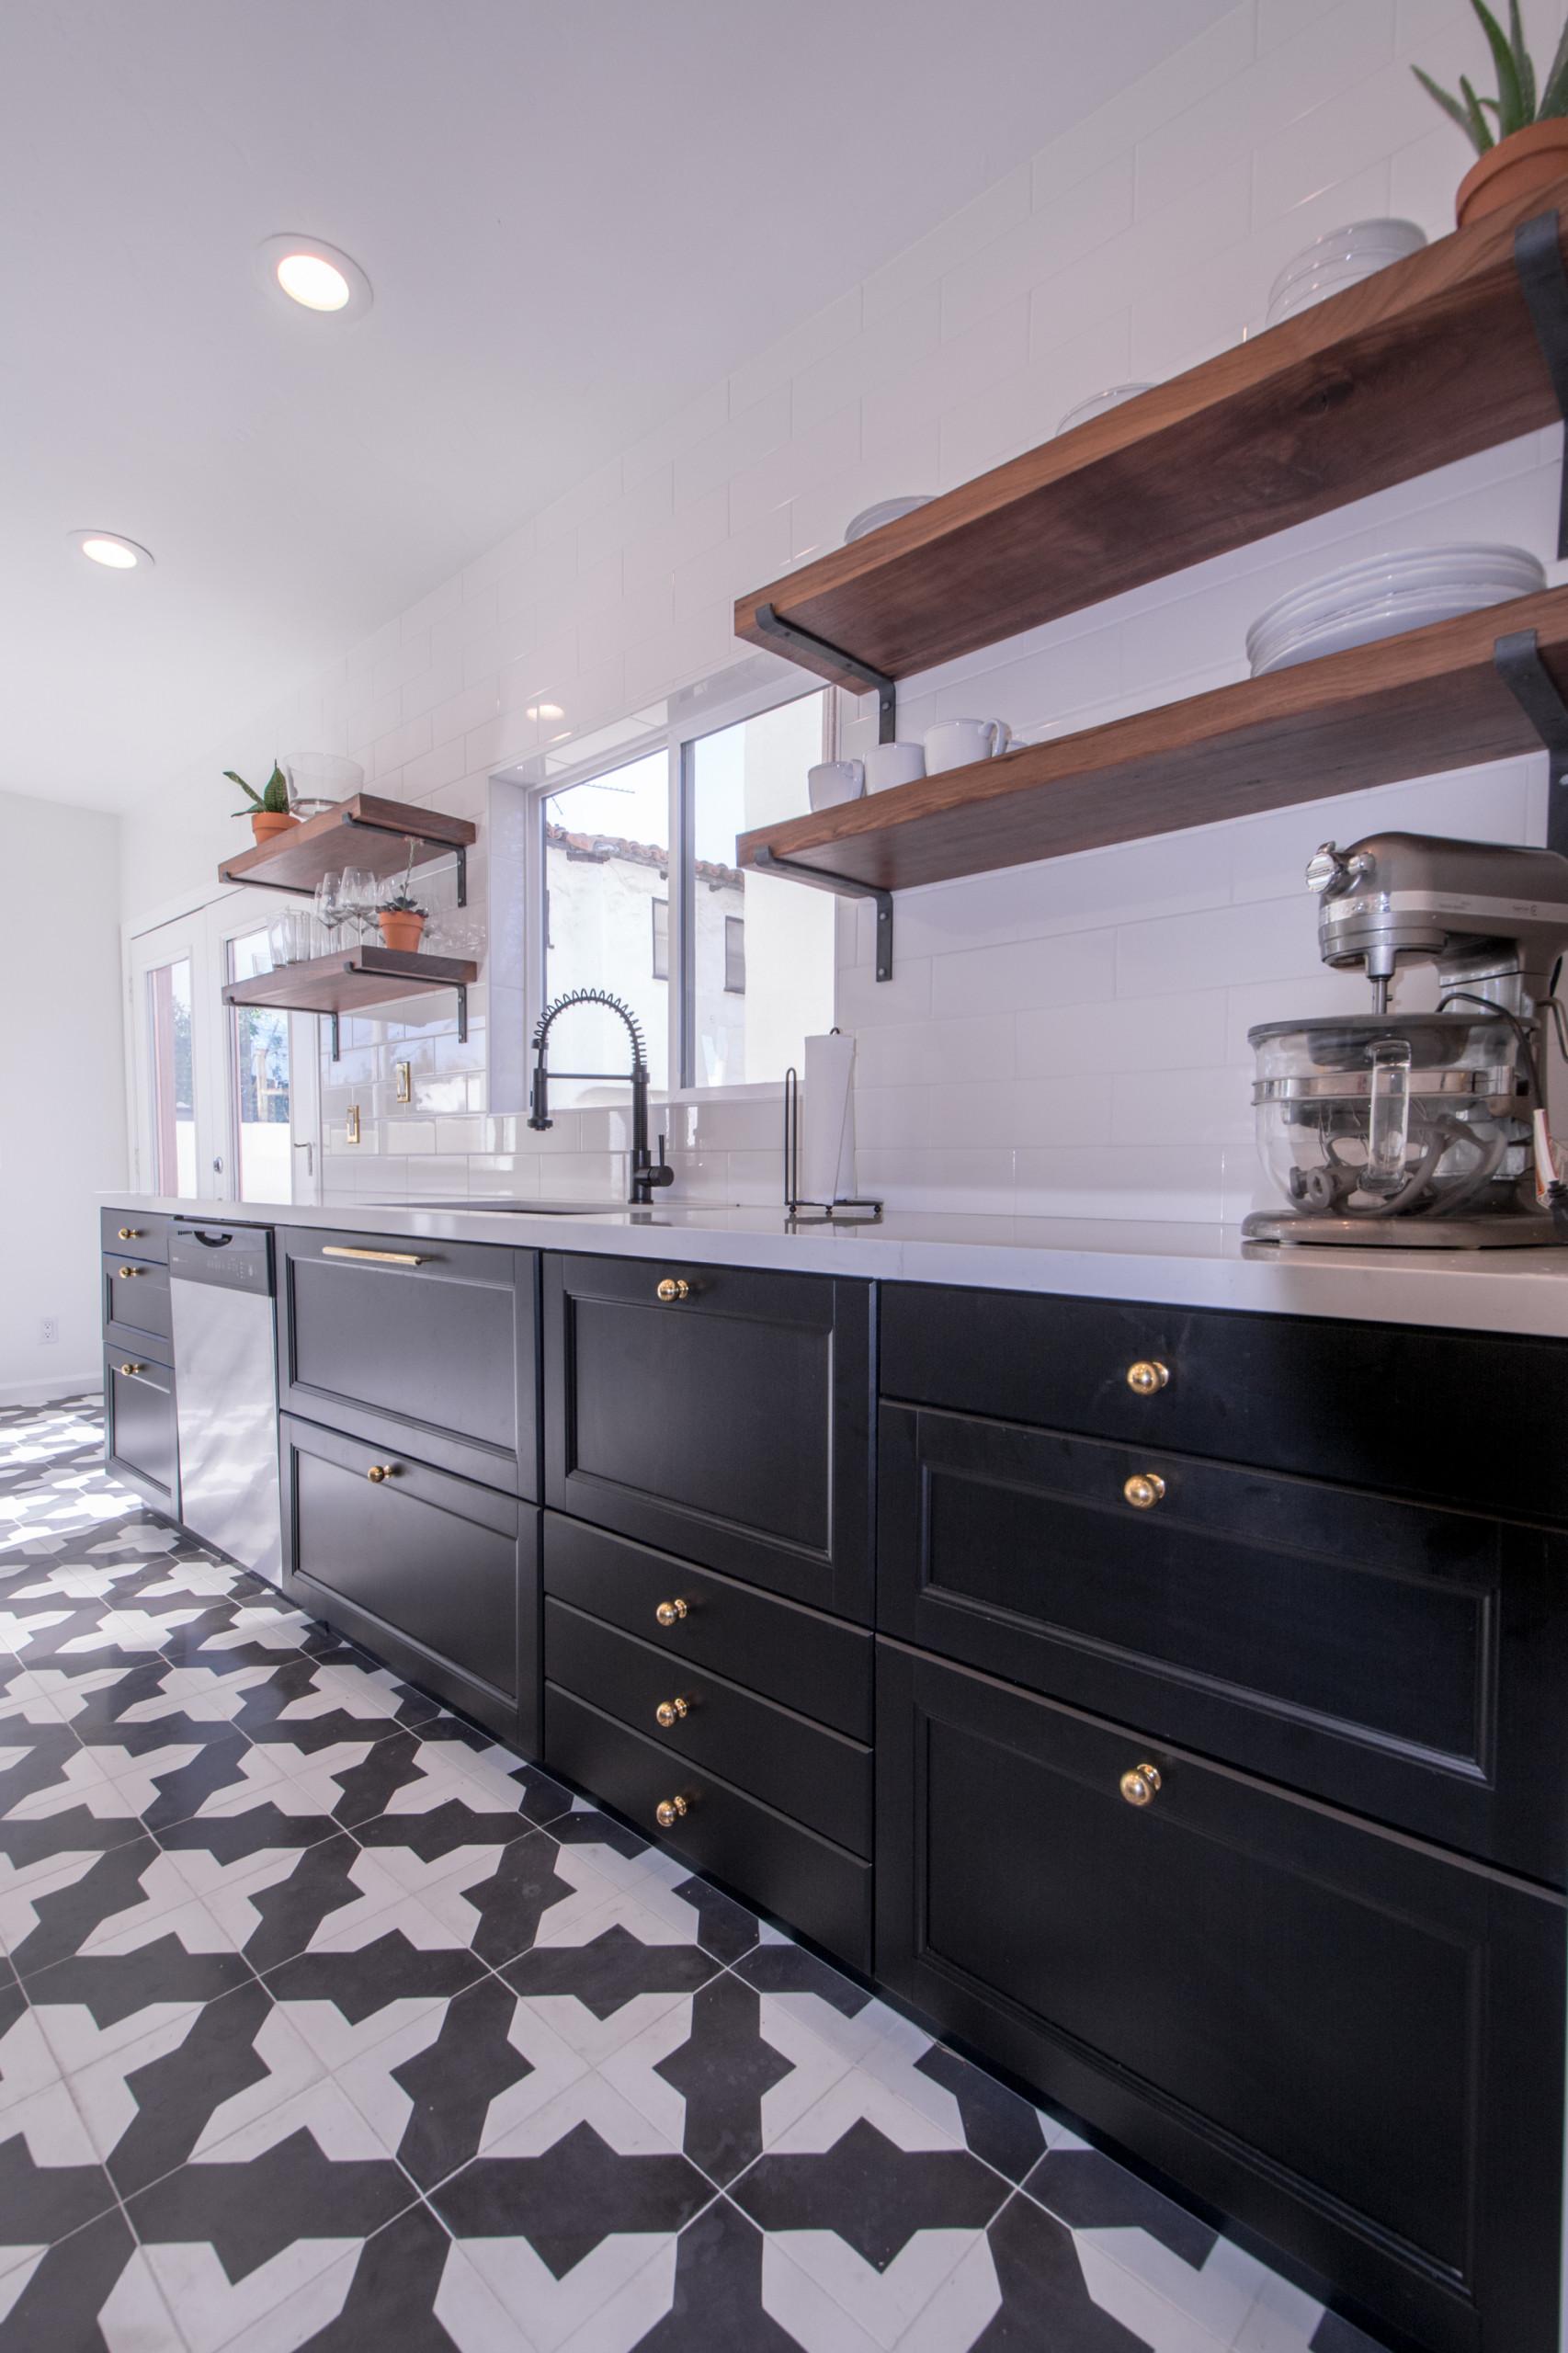 75 Beautiful Purple Kitchen Pictures Ideas January 2021 Houzz